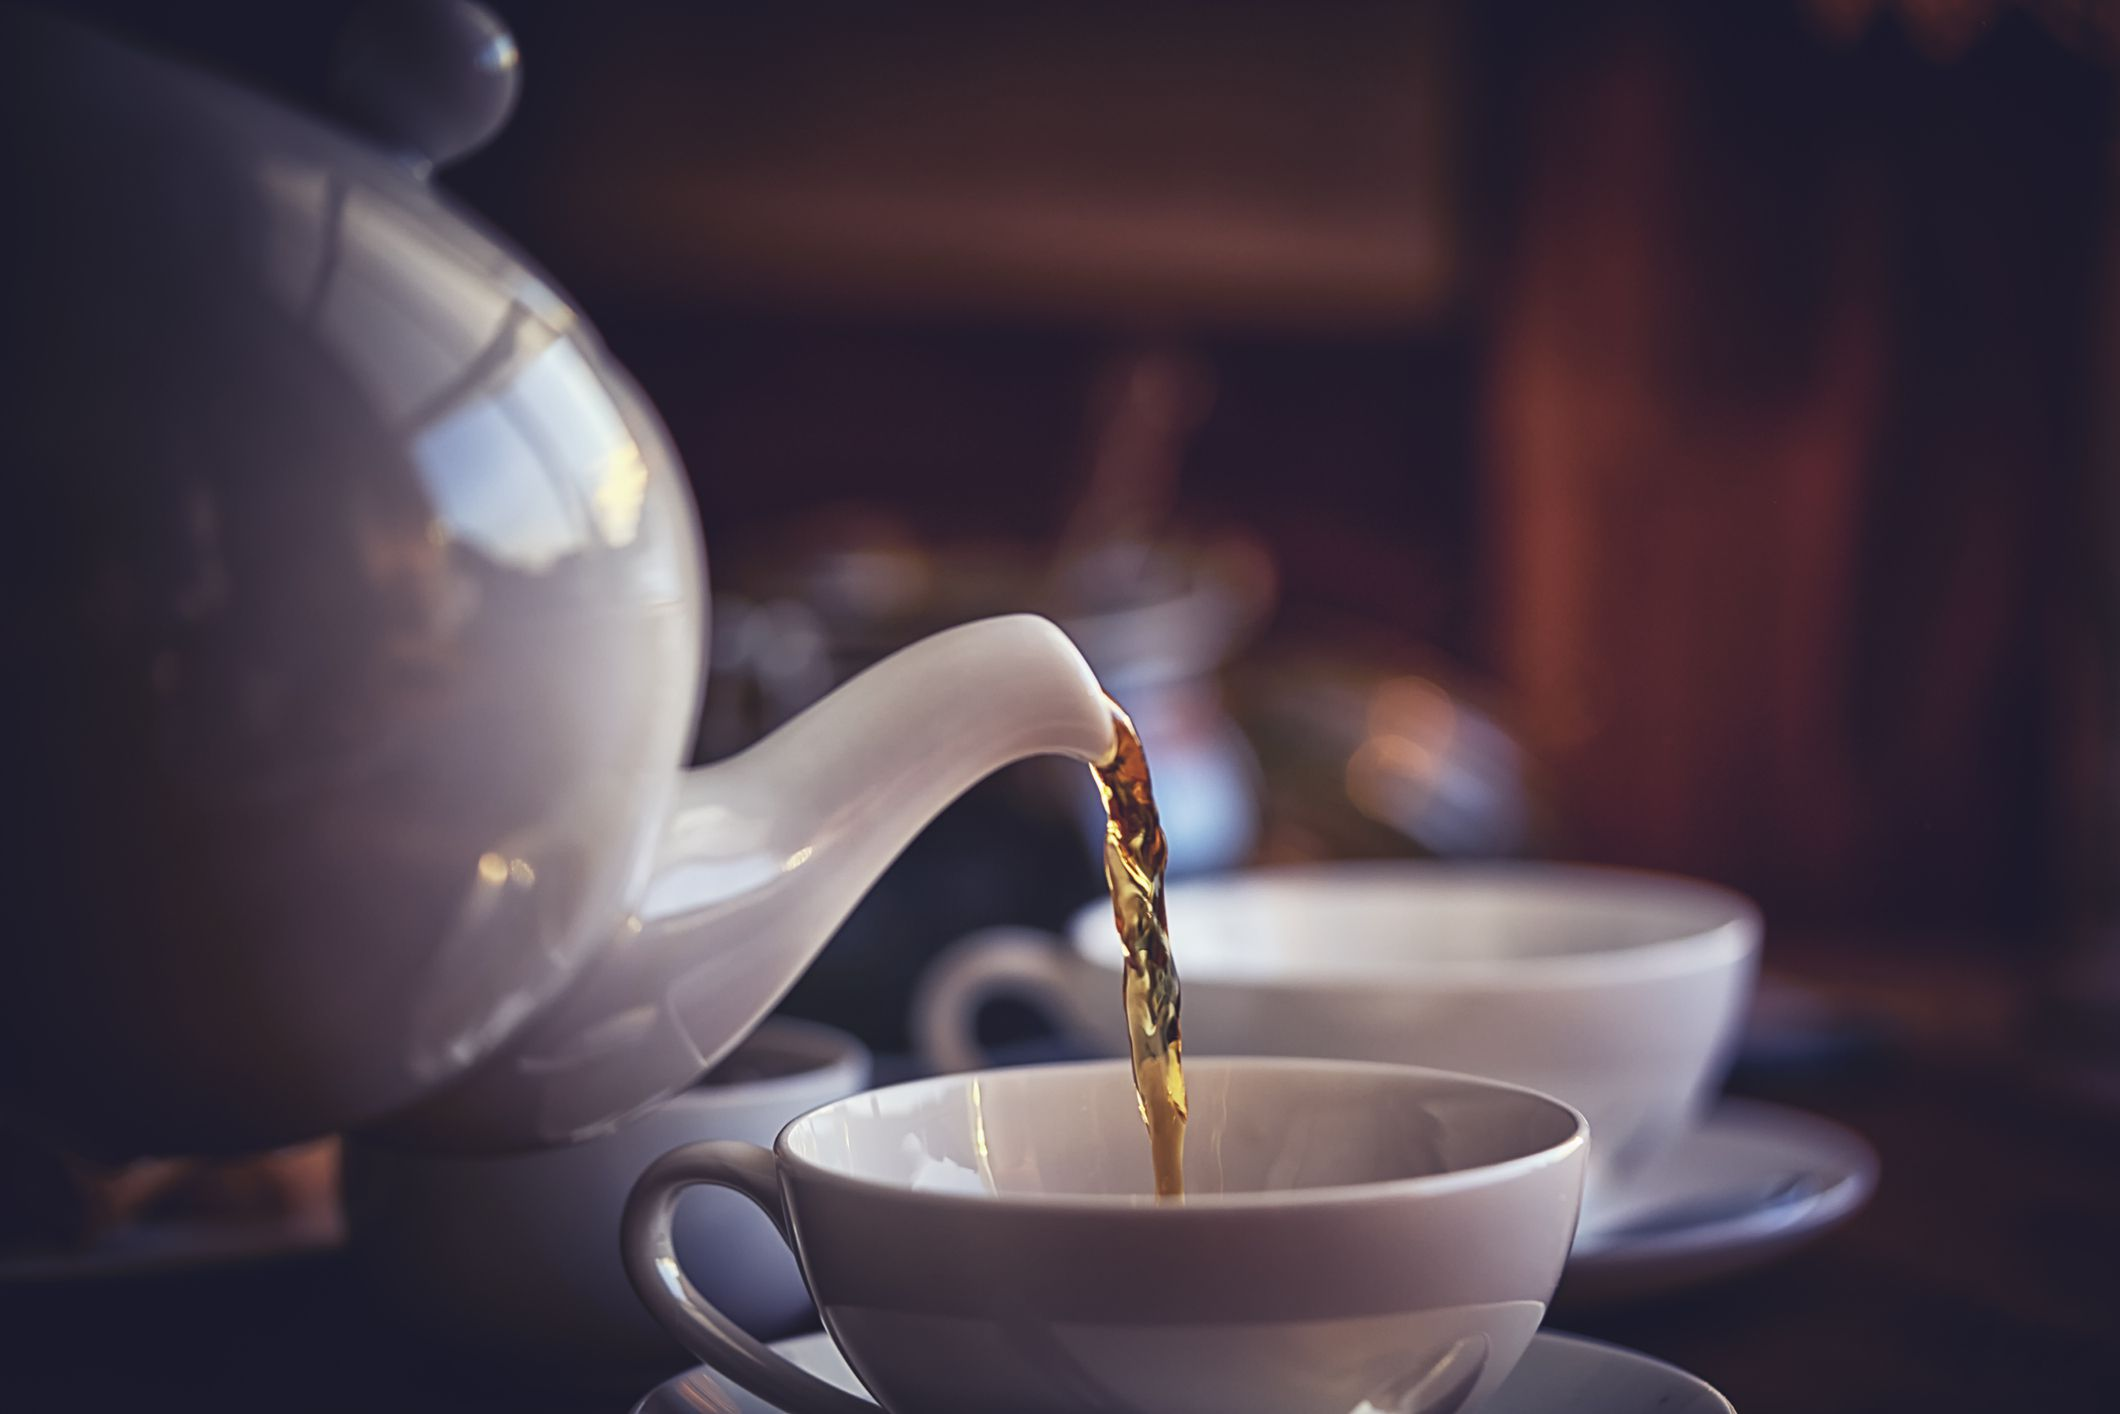 Black tea poured into cup